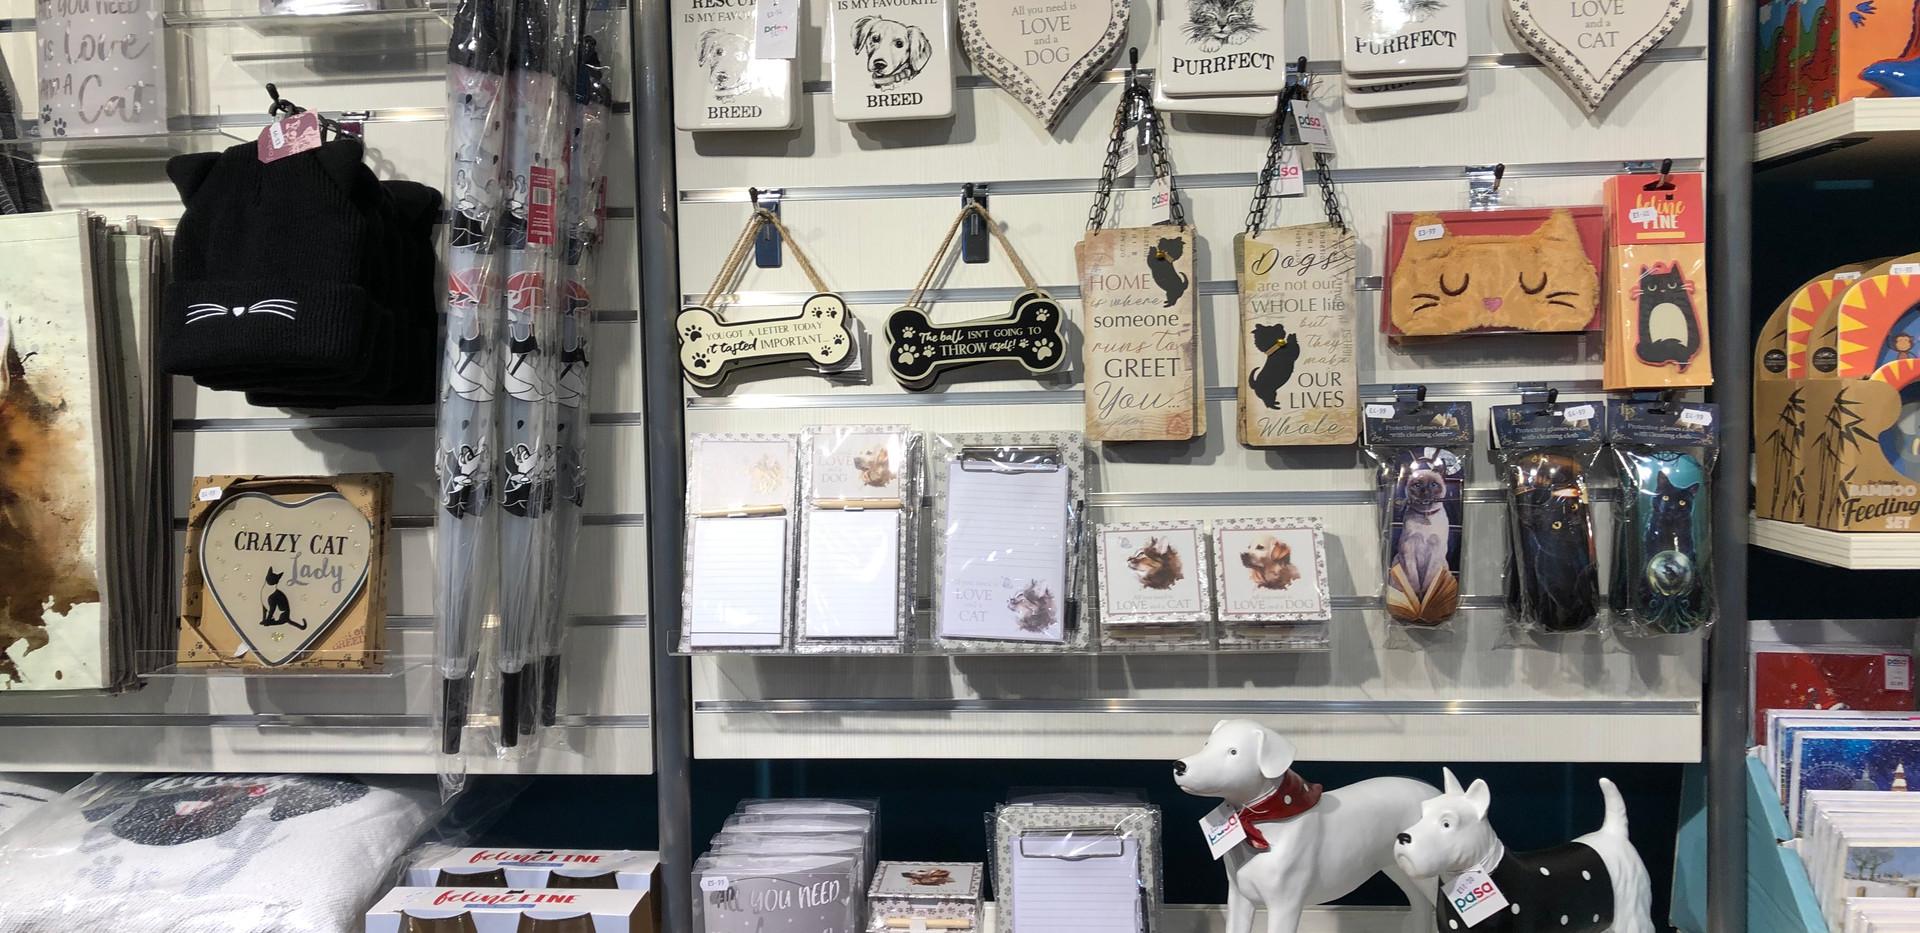 PDSA shop